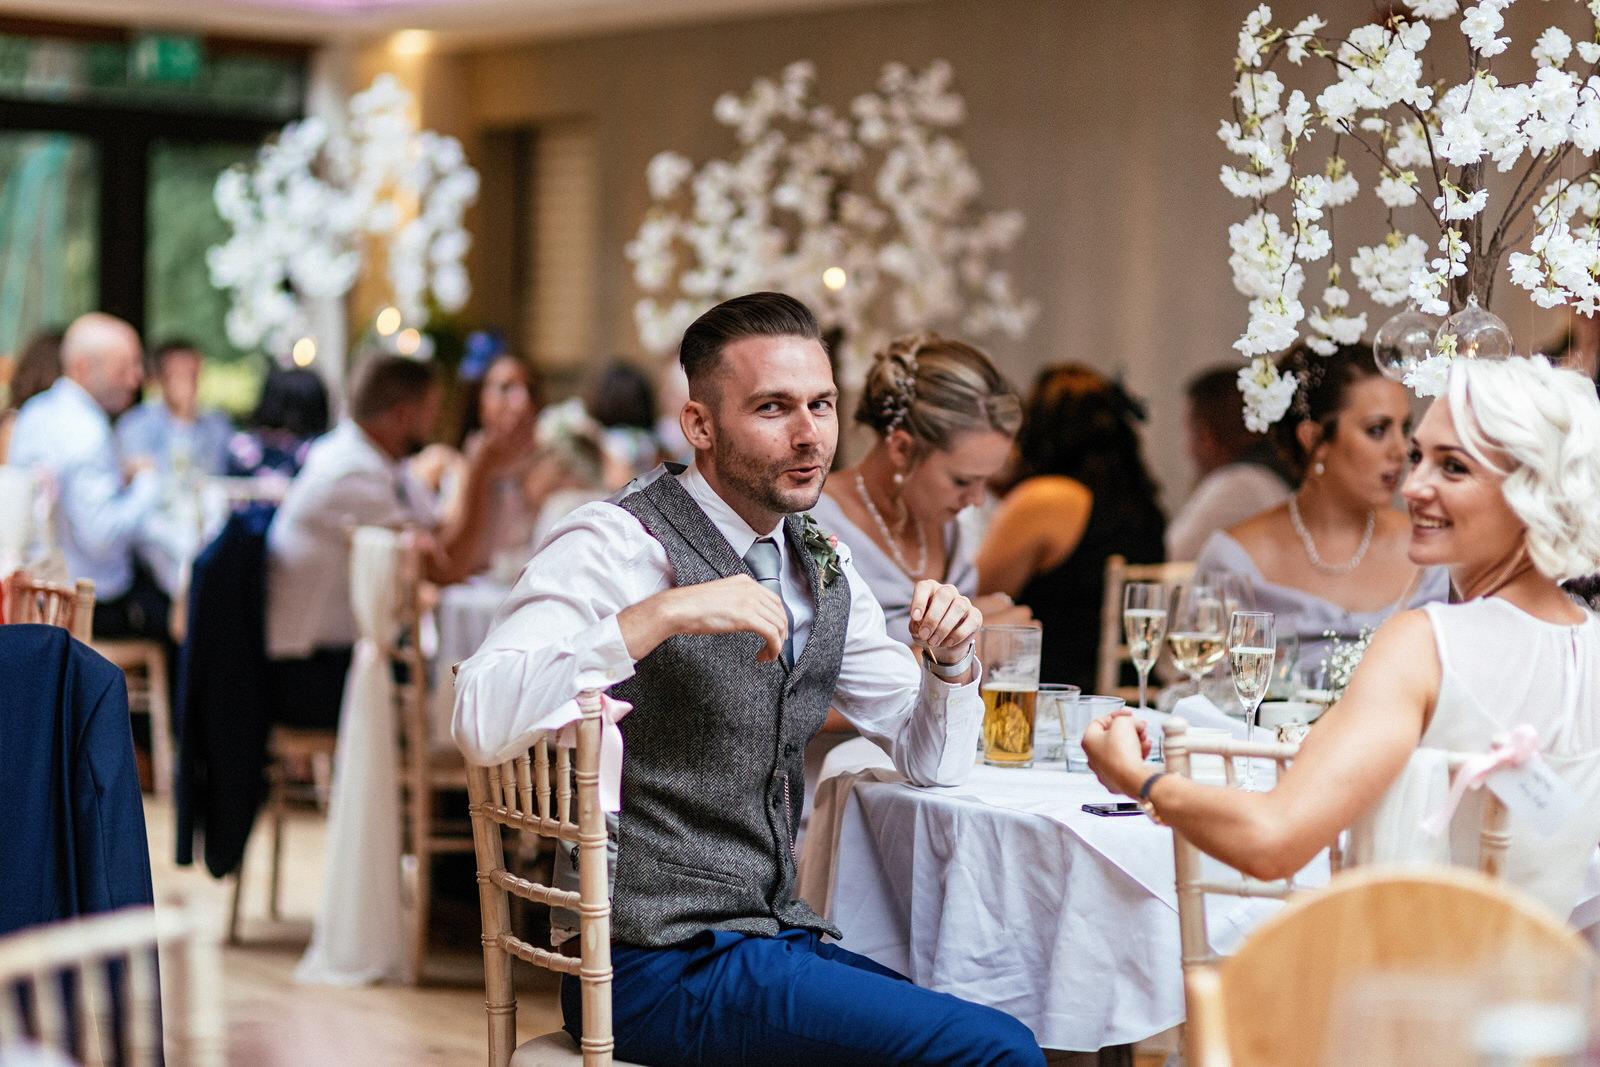 Moddershall-Oaks-Spa-Wedding-Photographer-046.jpg